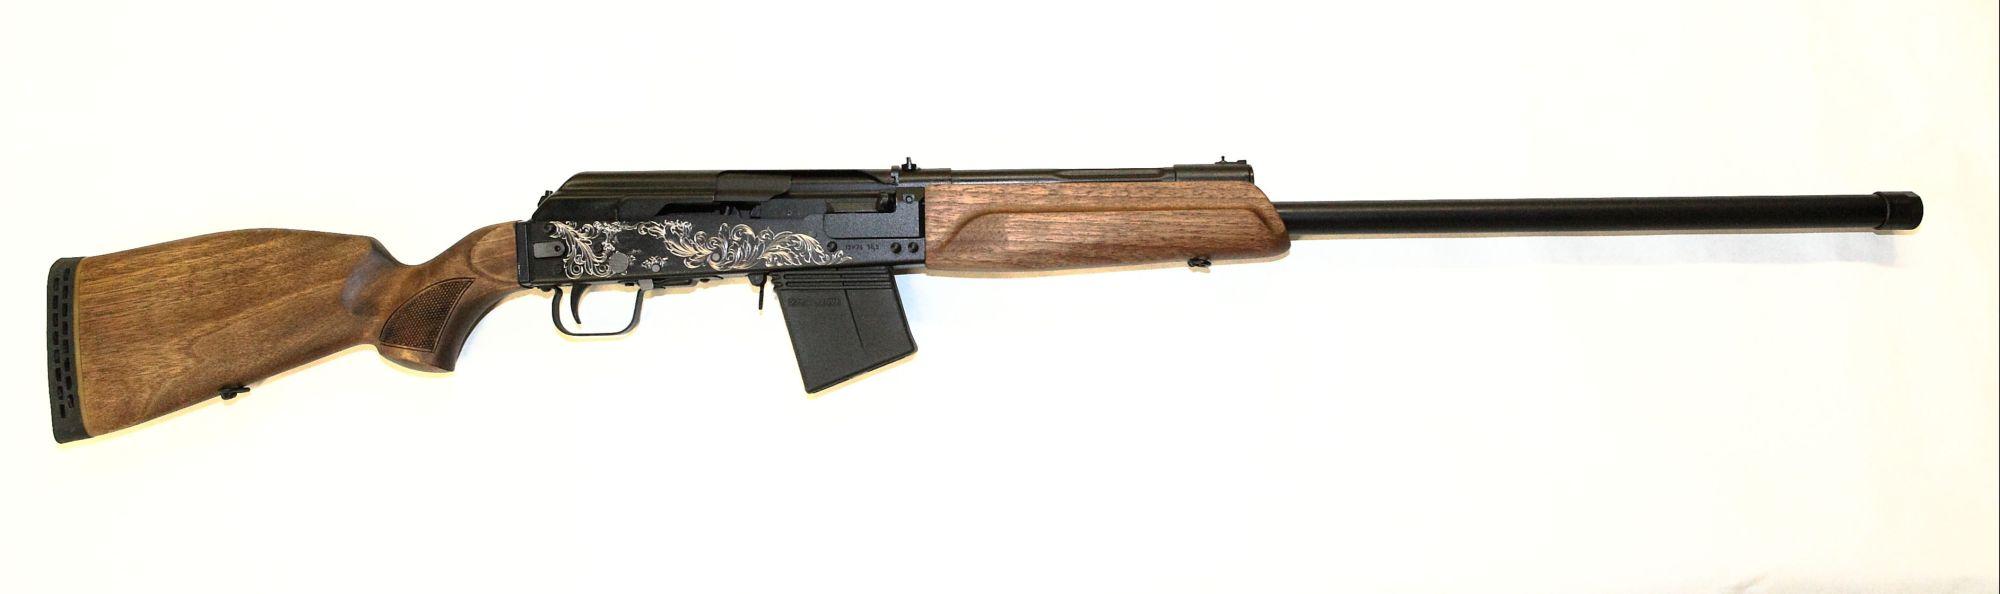 Ружье «Сайга-12 исп. 095» со сверловкой Ланкастера. Фото: Пресс-служба ОАО «Ижмаш».